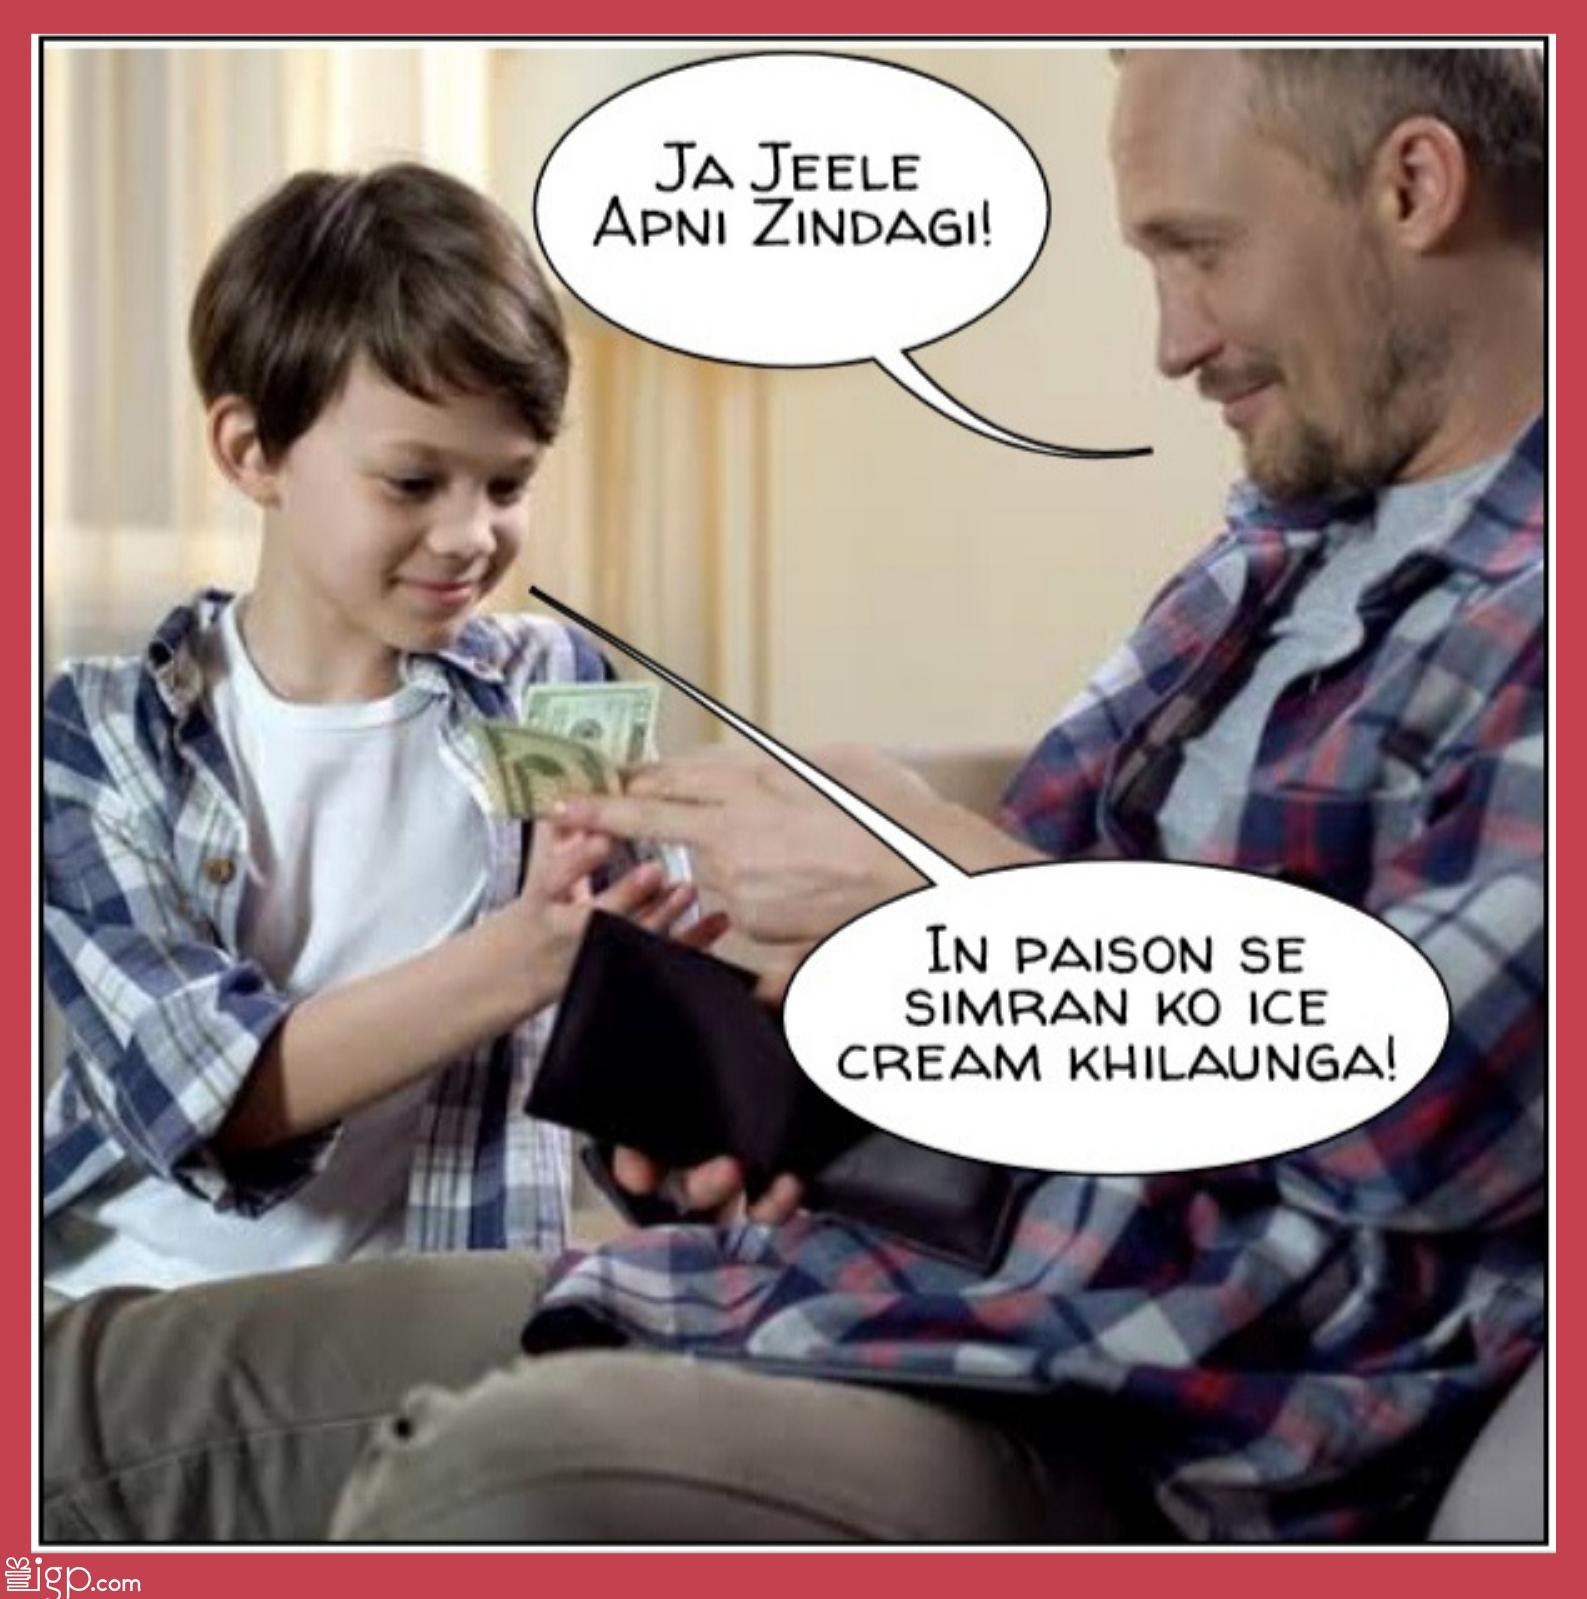 Dad giving extra pocket money